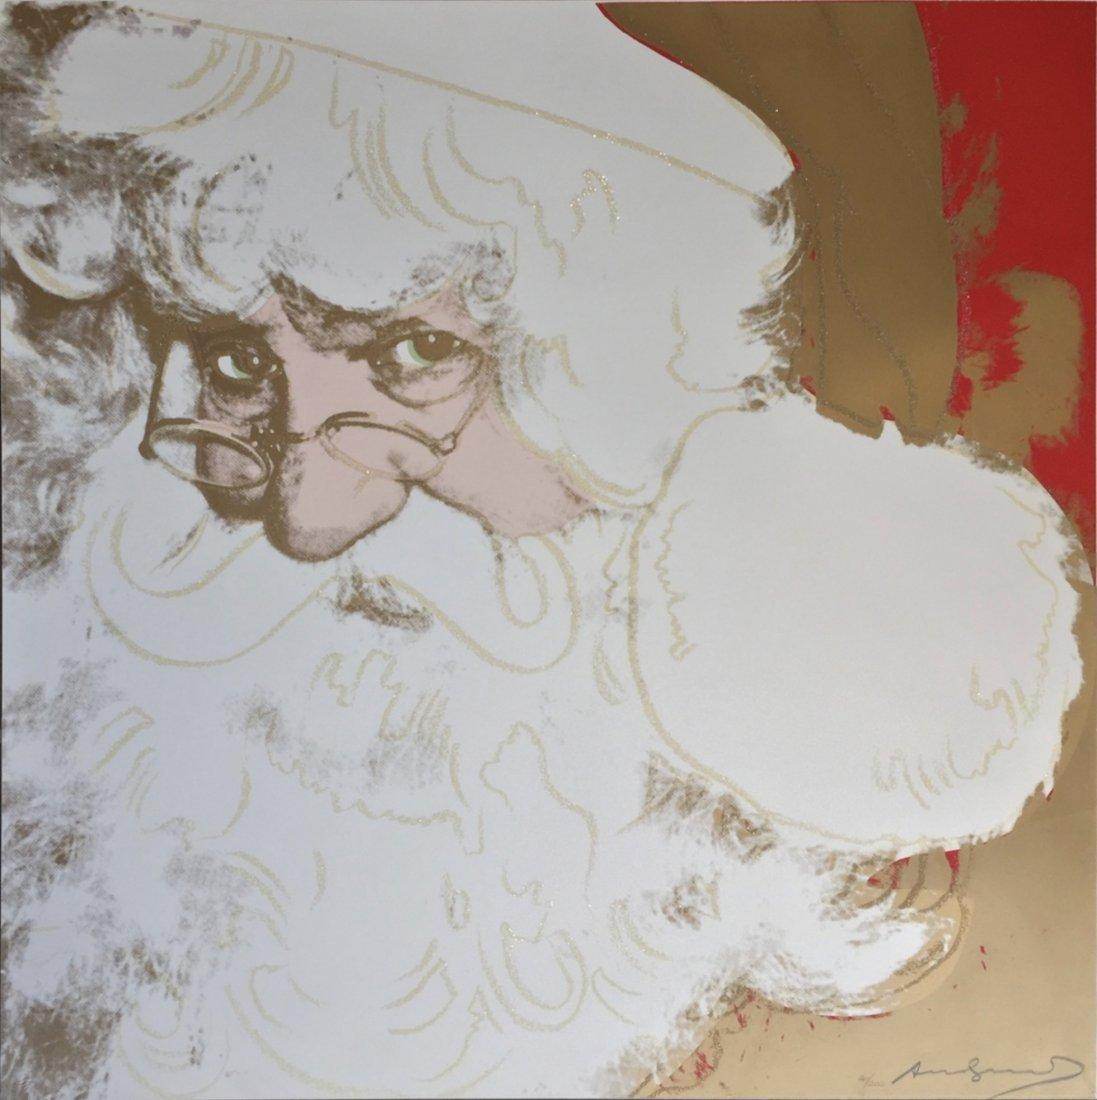 Santa Claus by Andy Warhol: Printed 1981